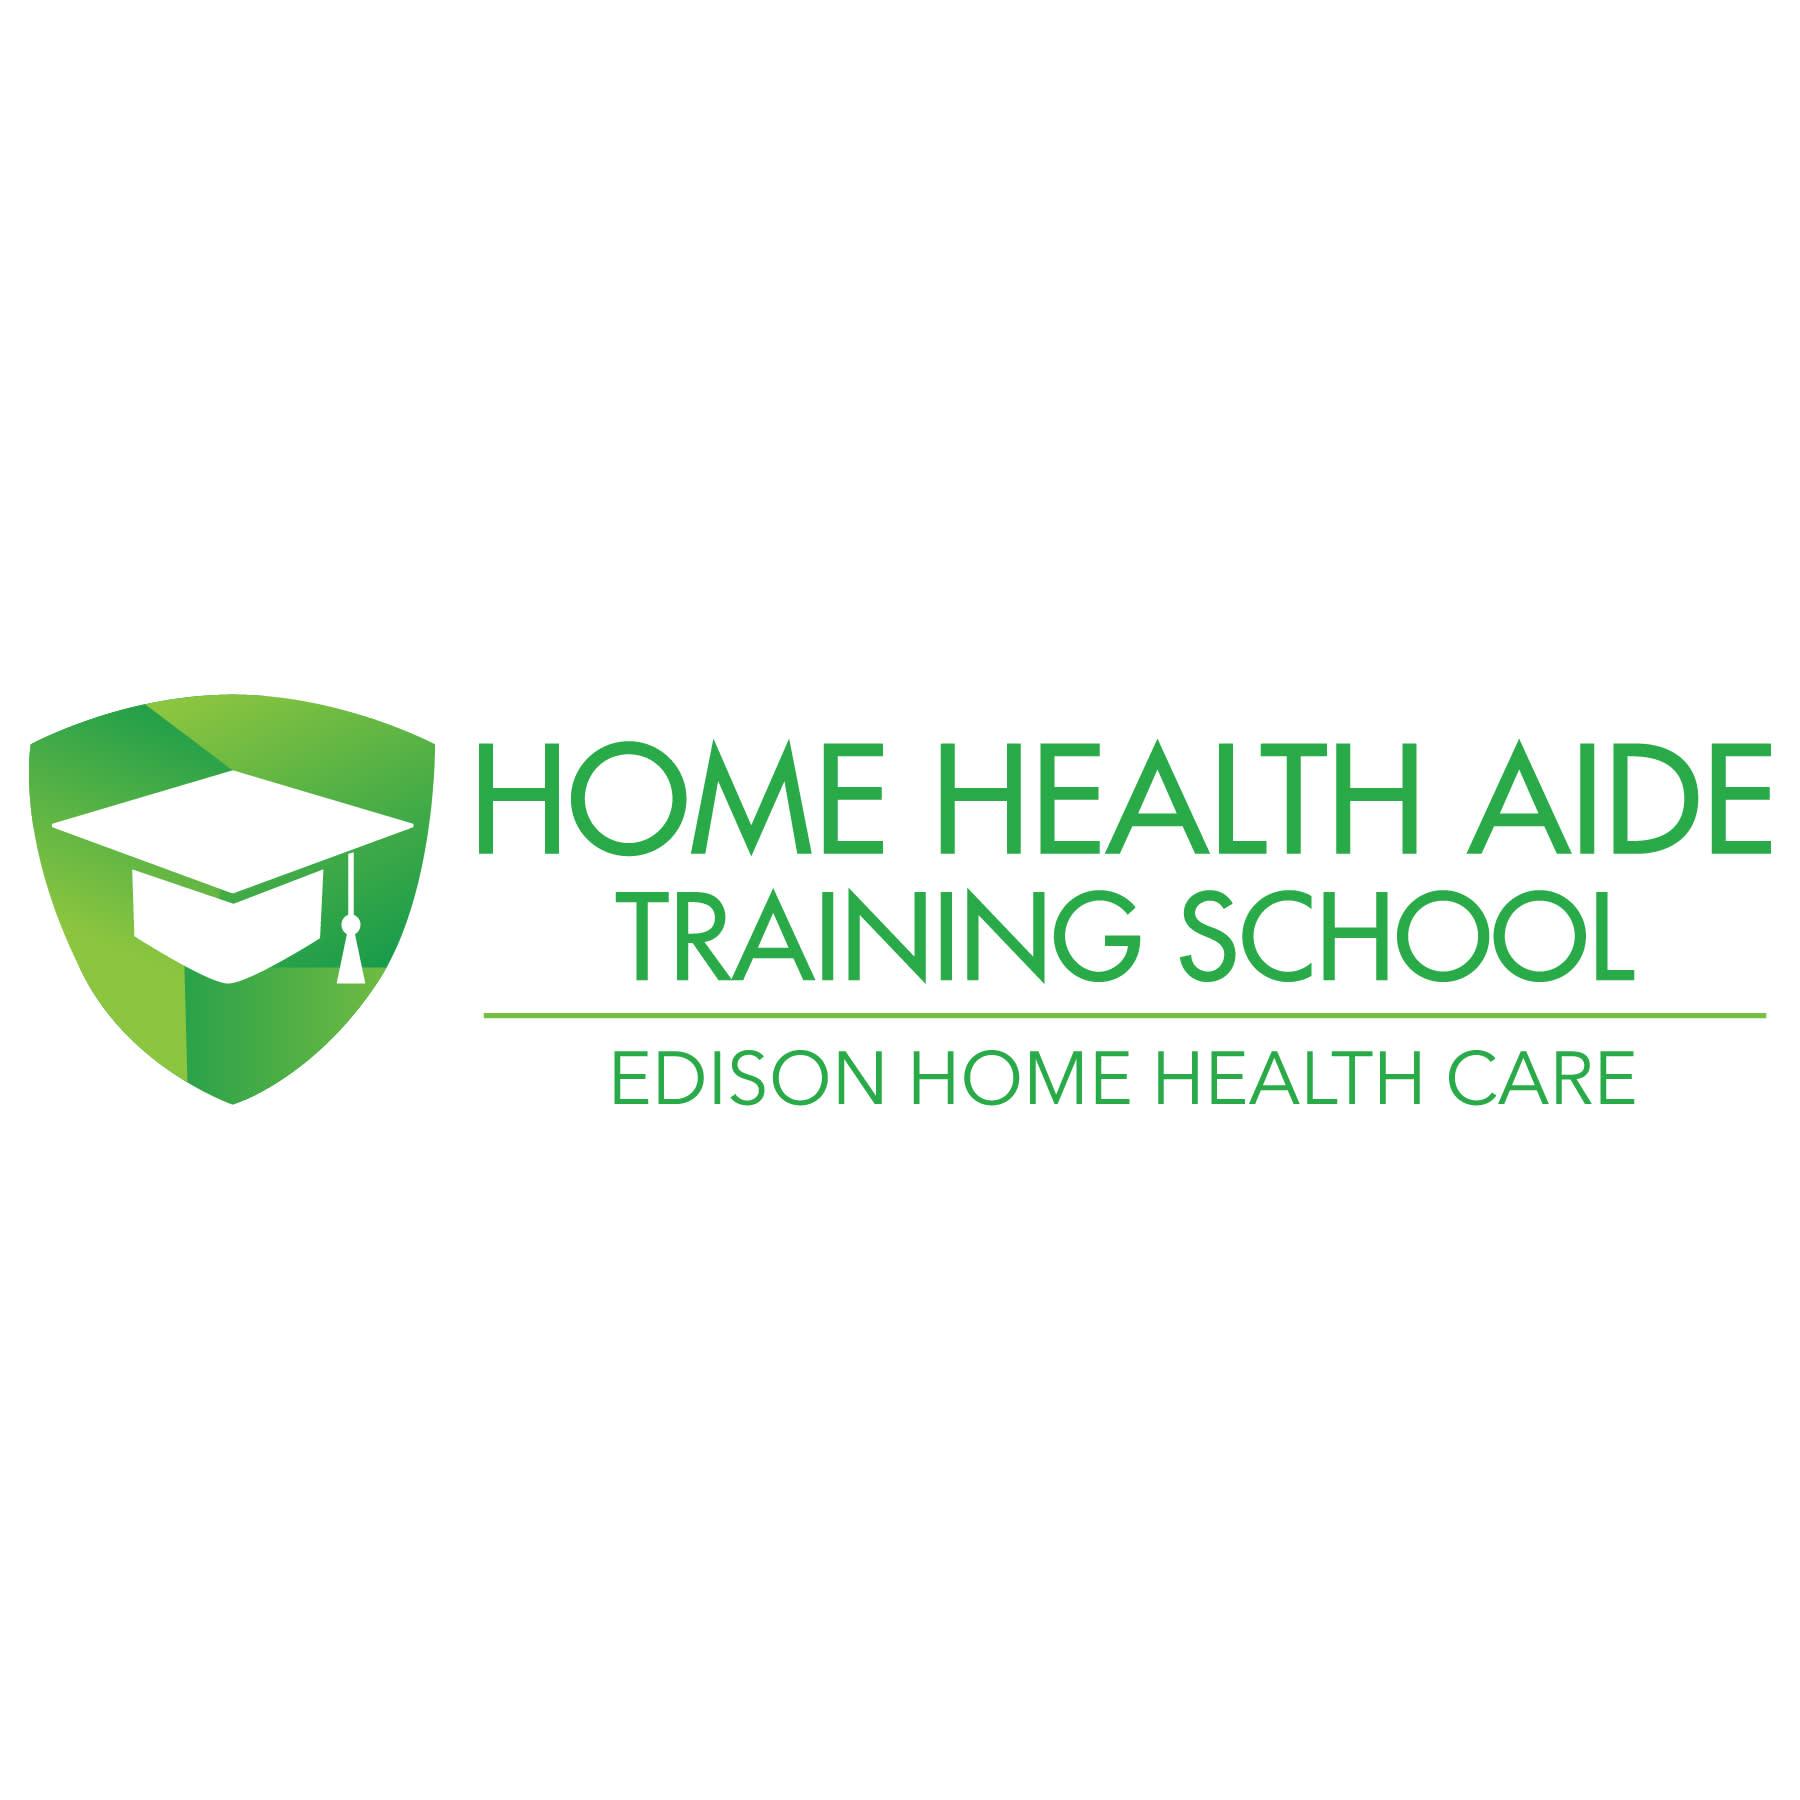 Home Health Aide Training School Of Edison Home Health Care Crunchbase